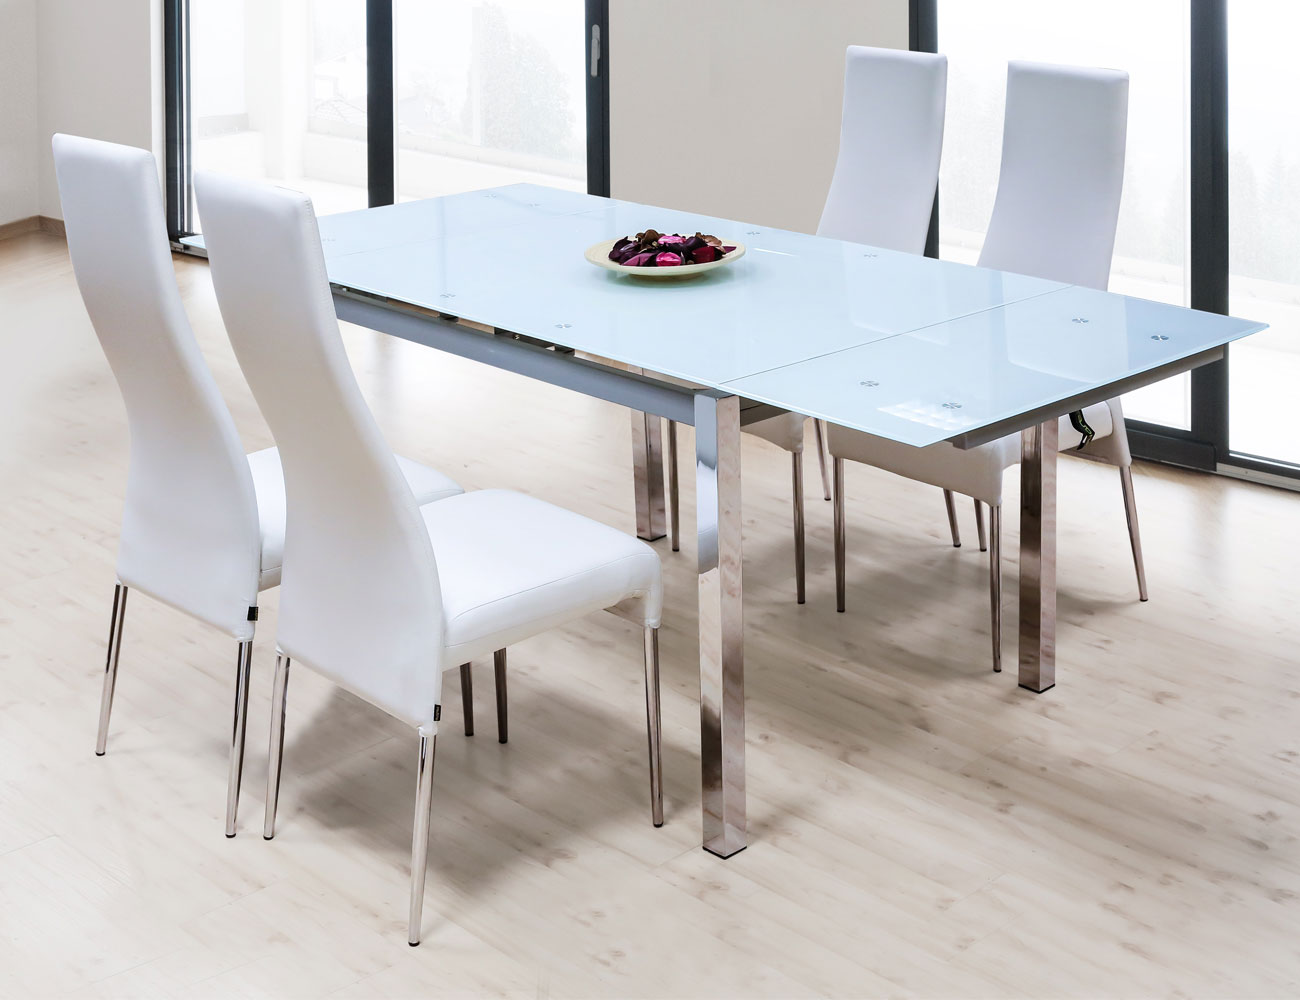 mesa de comedor de cristal templado extensible con alas